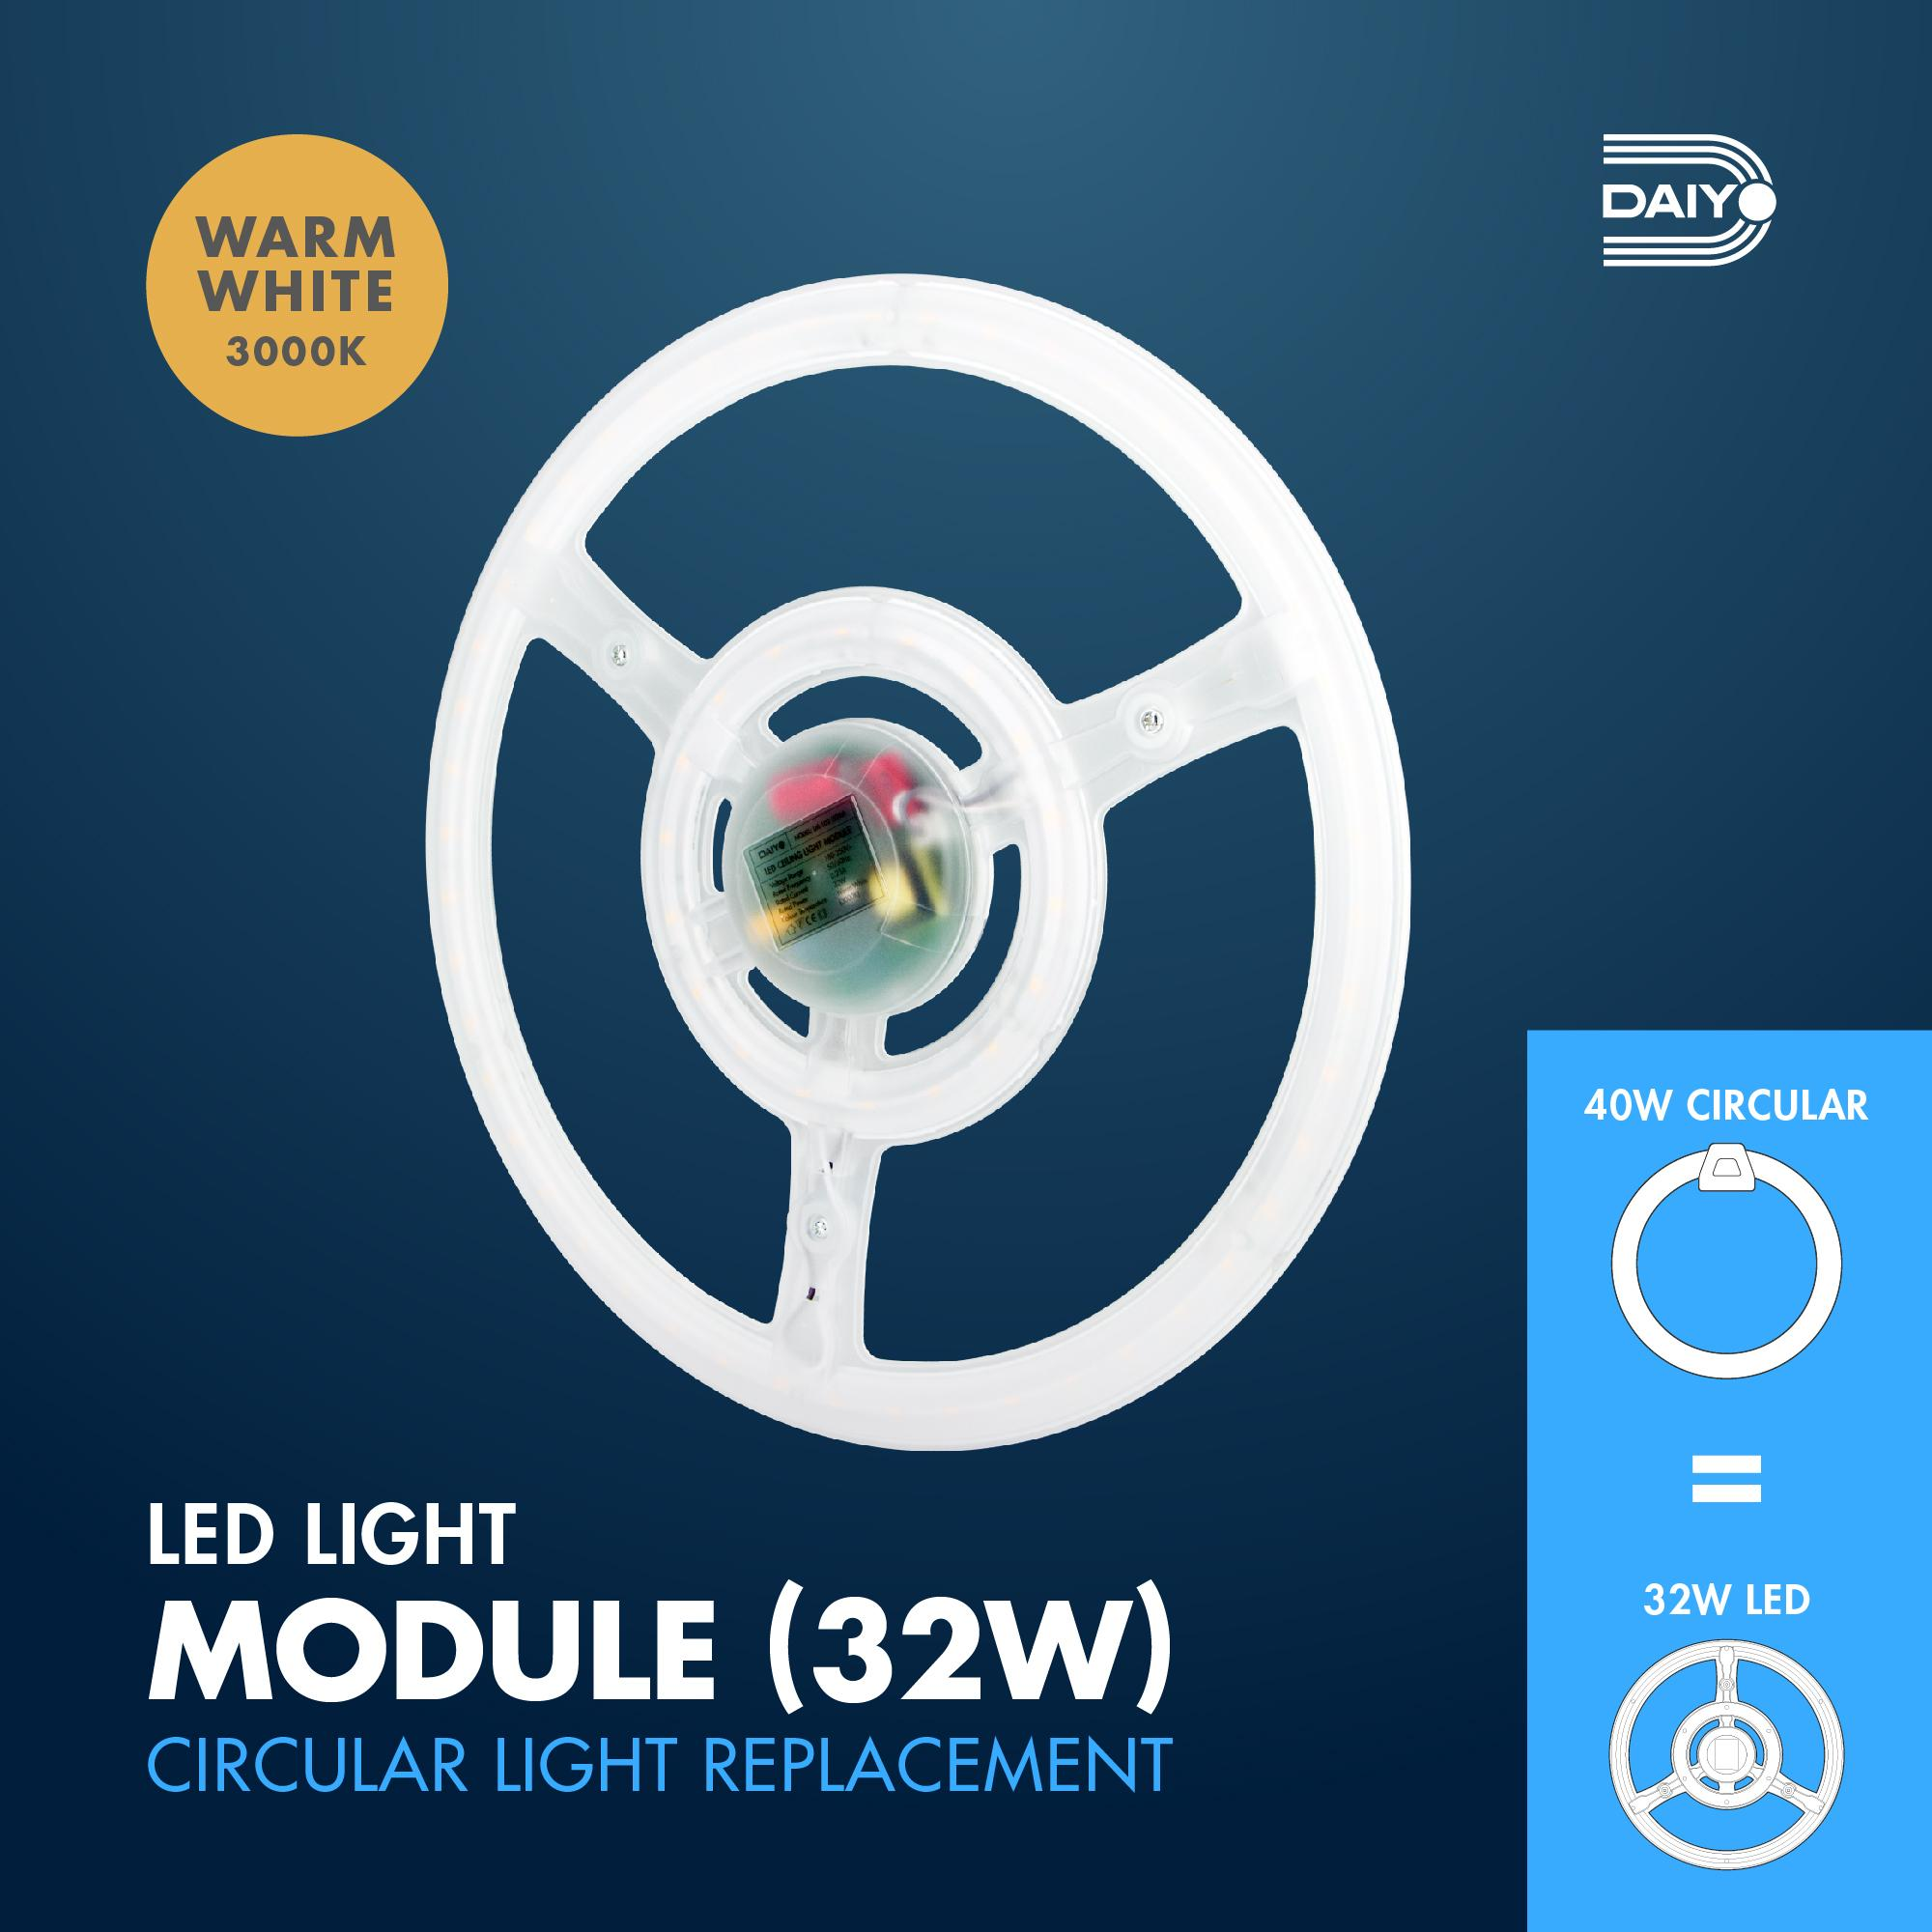 32W LED Round Shape Circular Magnetic Base Ceiling Panel (Warm White)